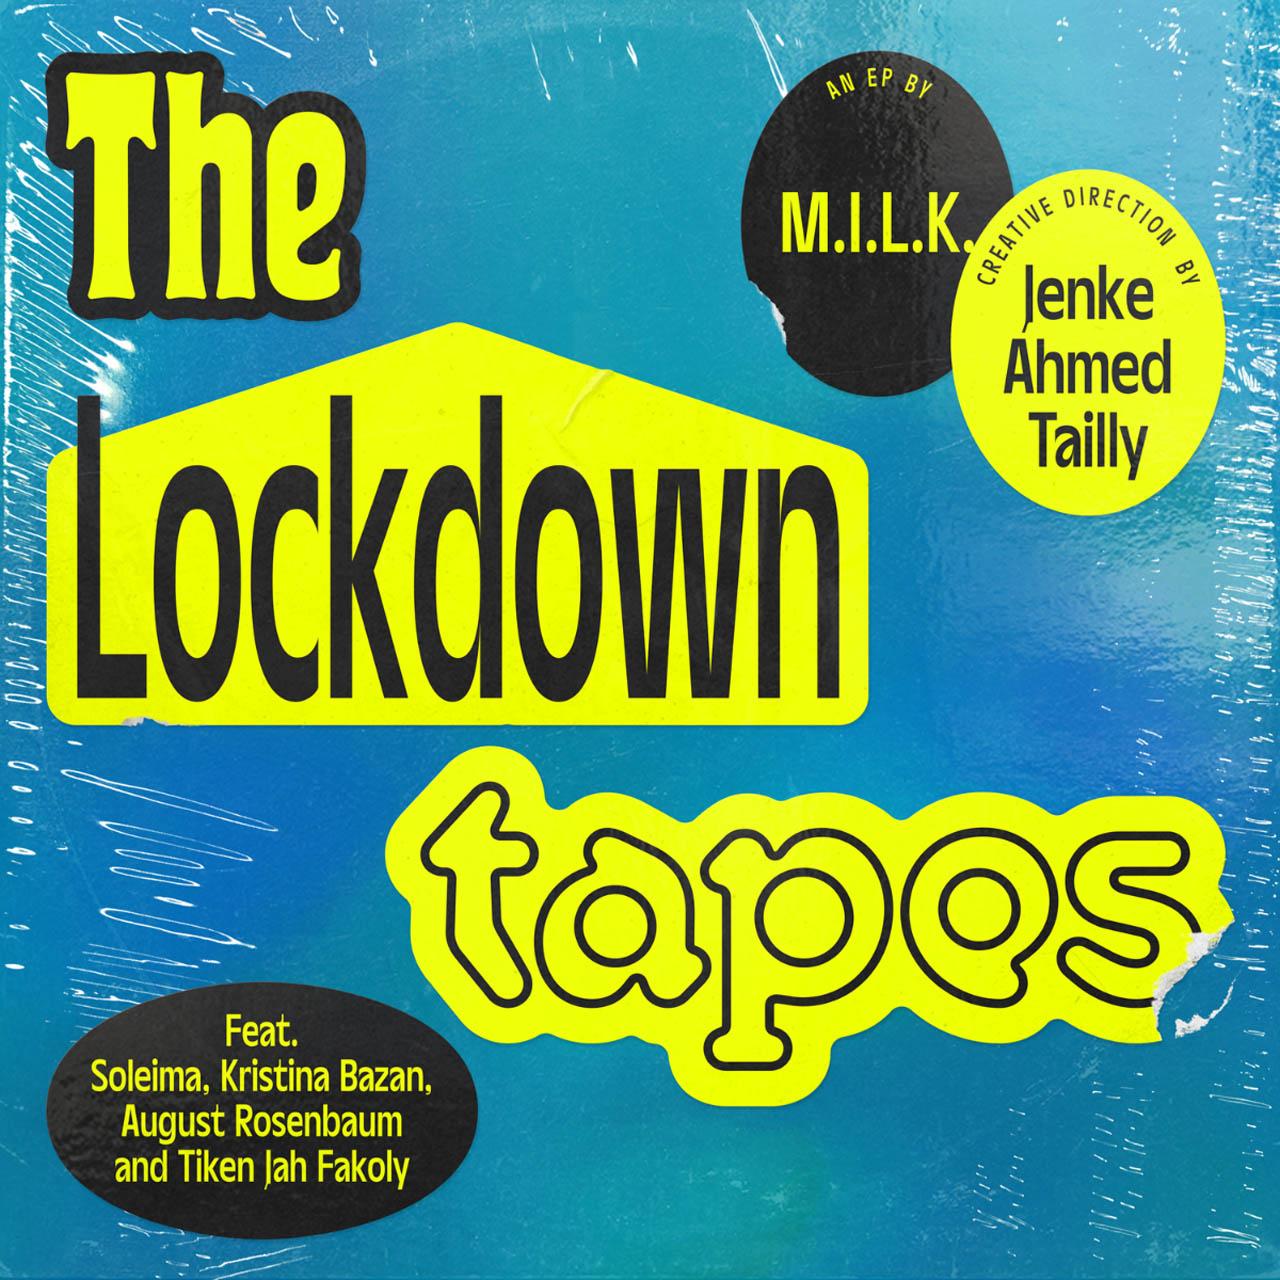 MILK - The Lockdown Tapes